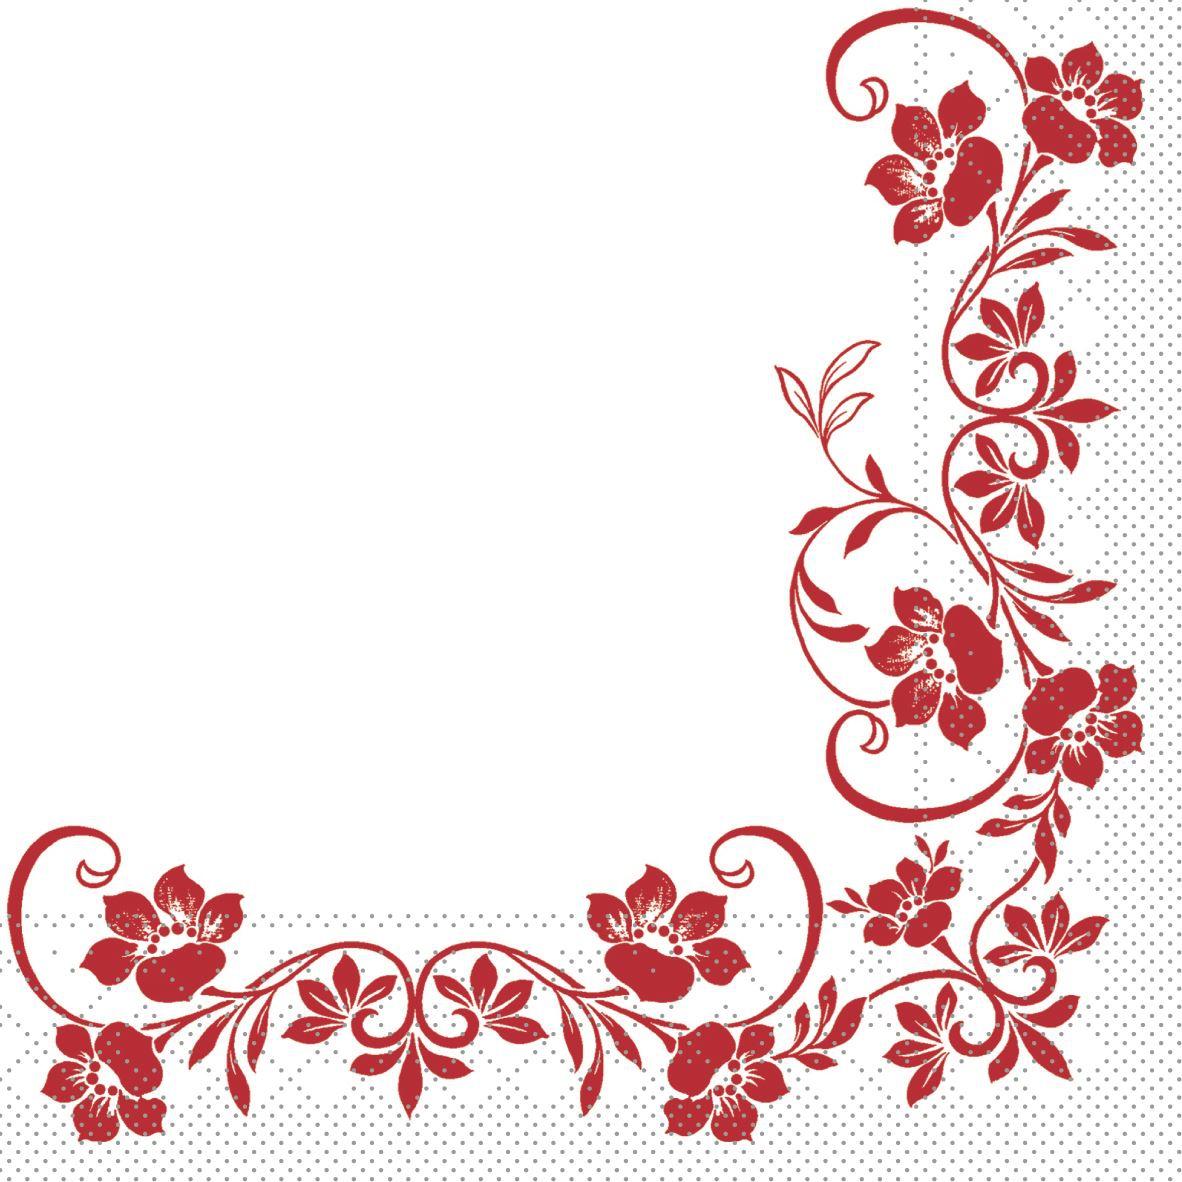 Tissue Servietten 33x33 cm - Katja (bordeauxfarben)